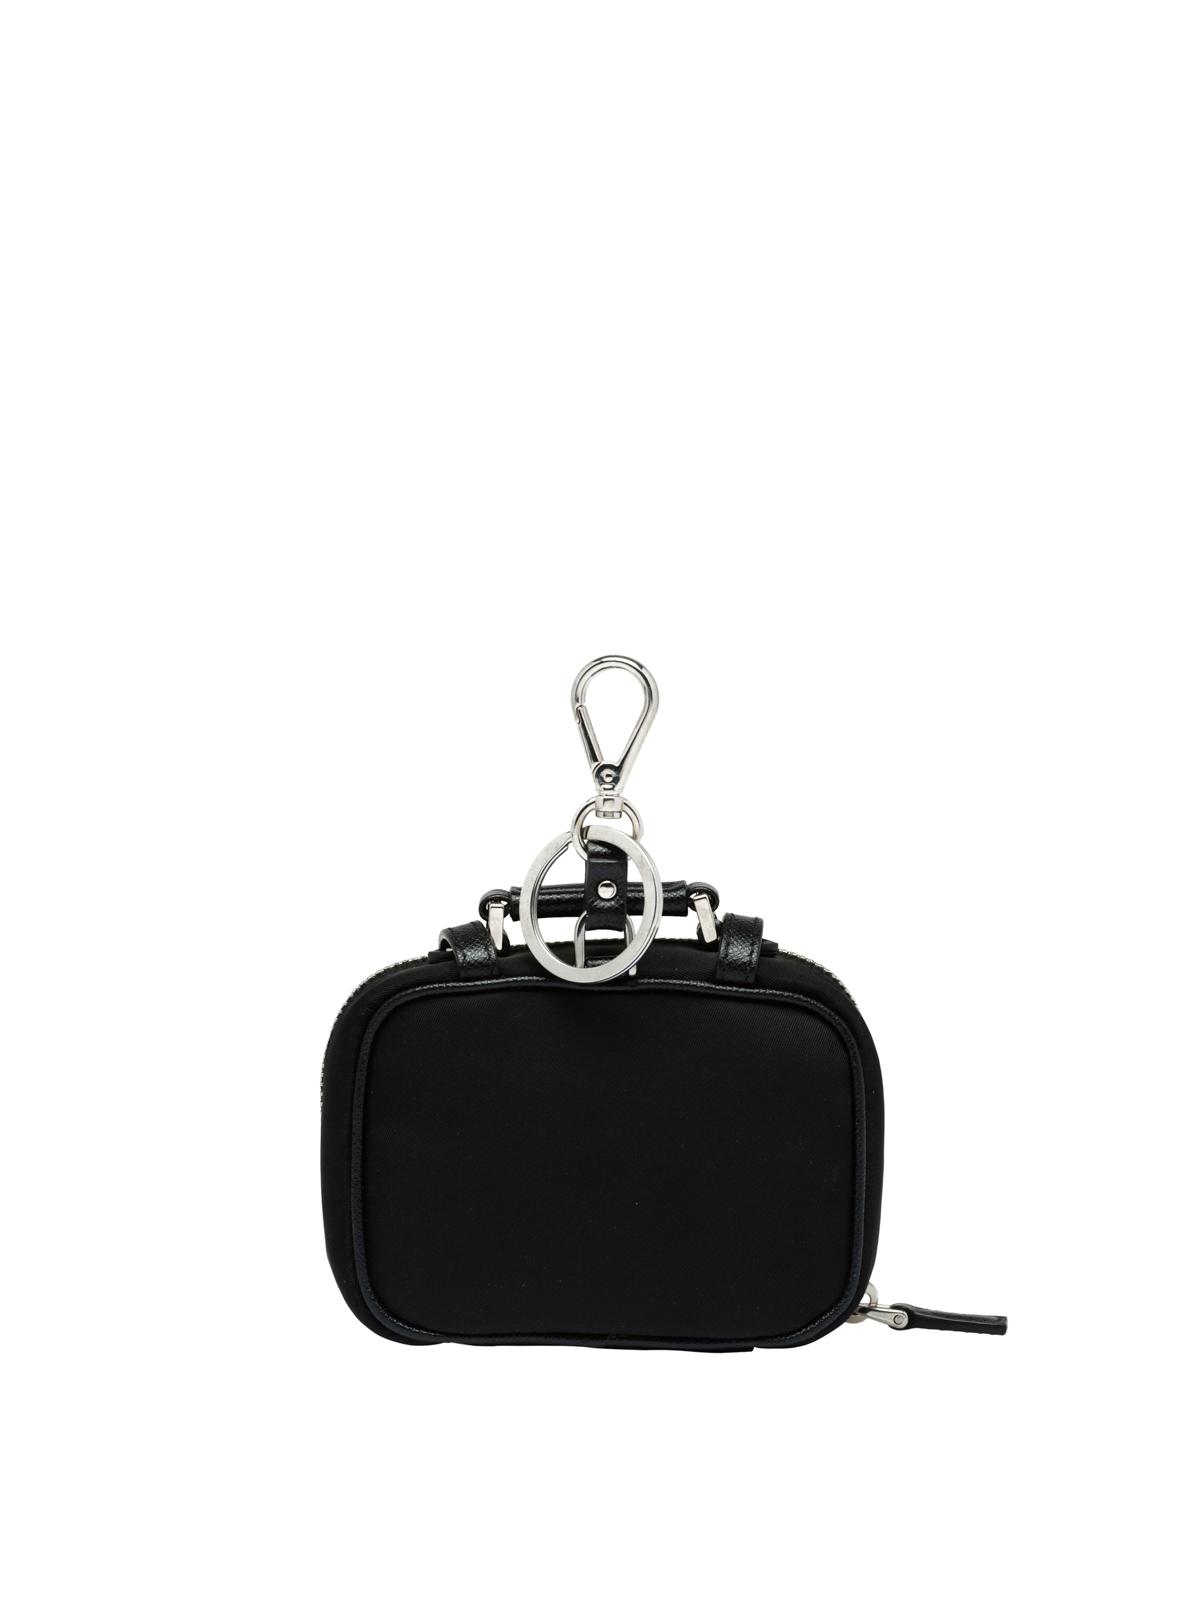 b35d1b5a94 Prada - Trick nylon and leather keyring - key holders - 2TT062 D02 F0002